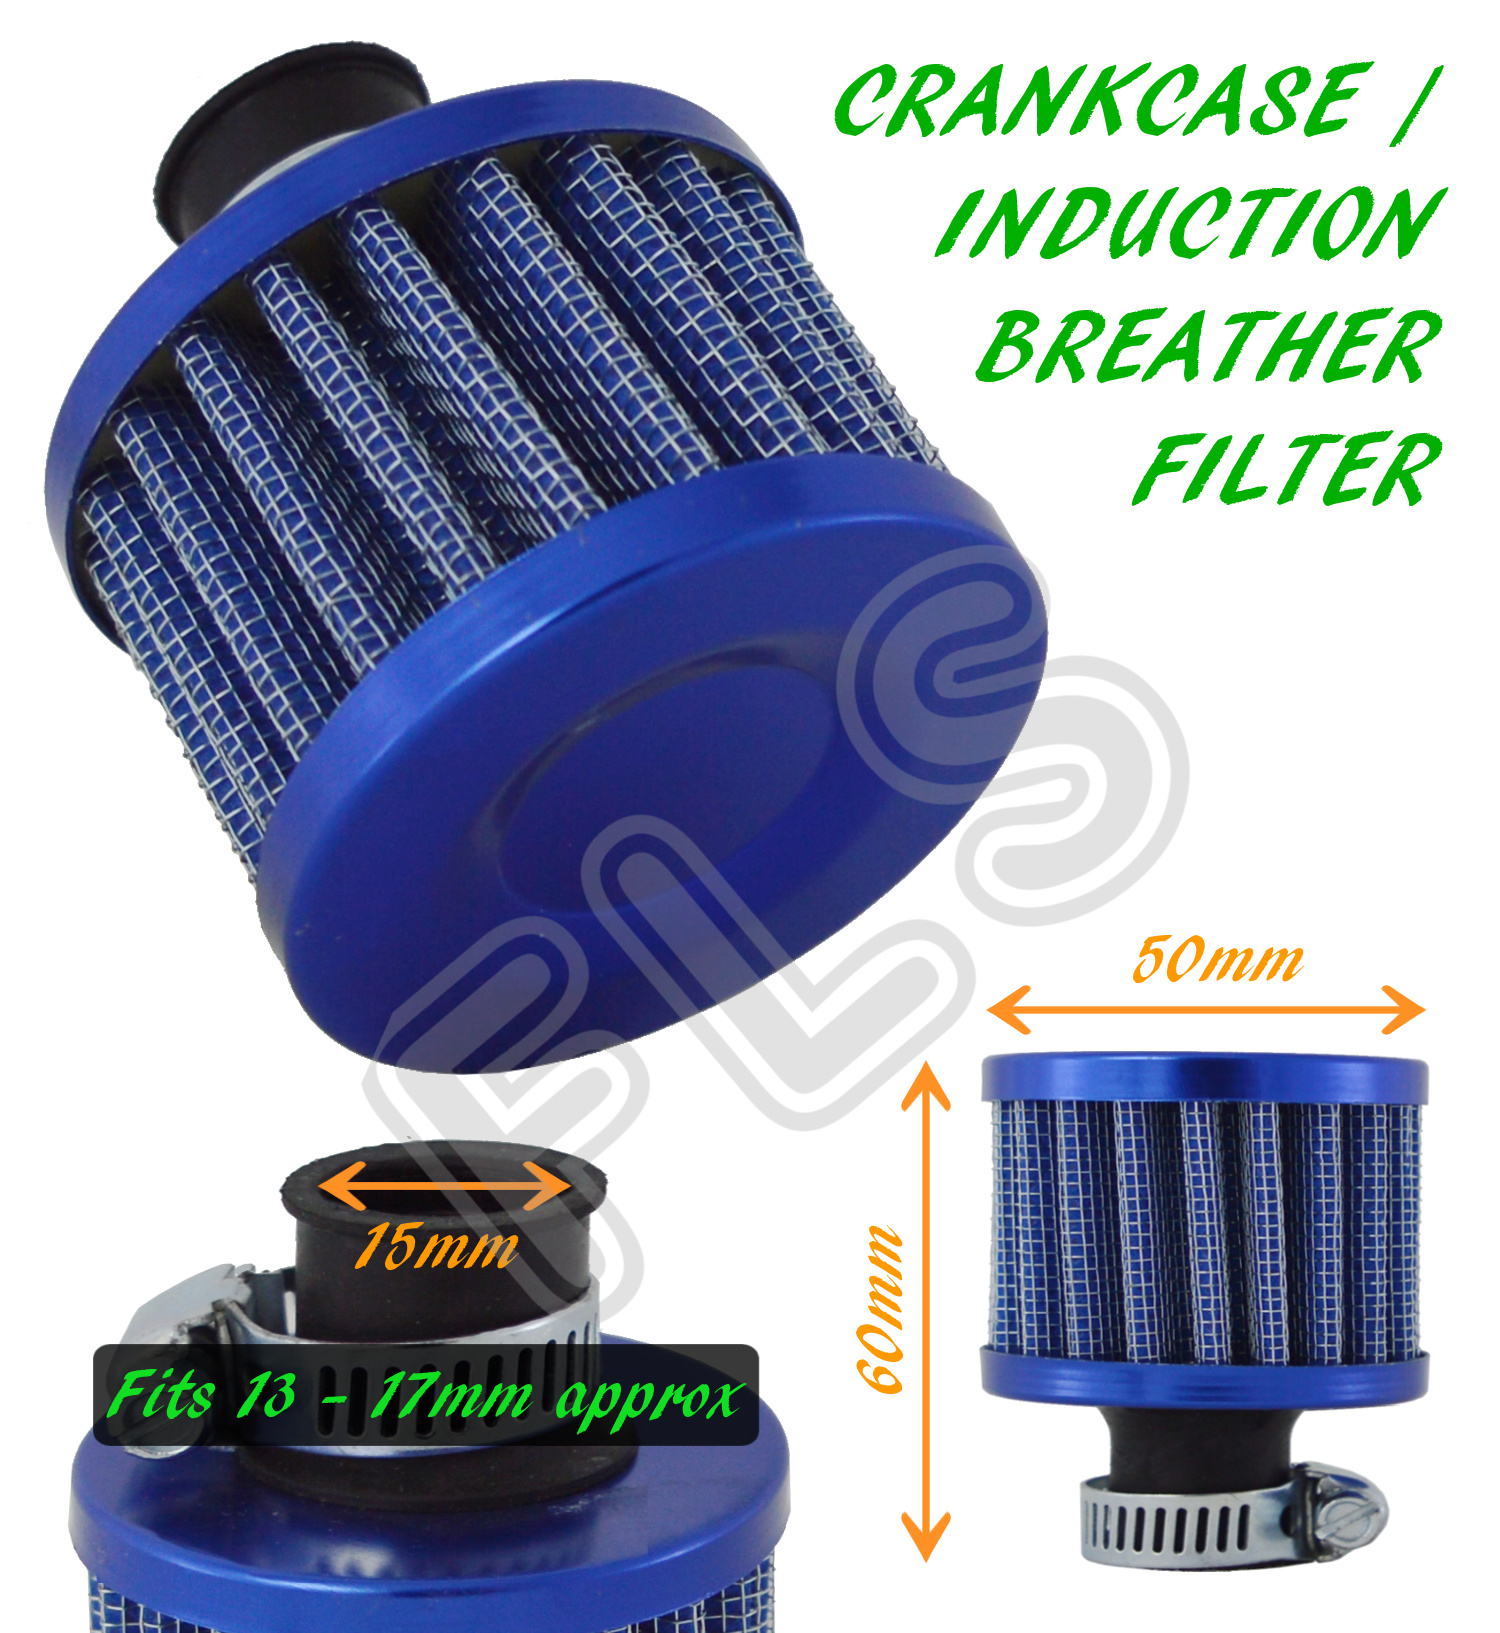 FUEL CRANKCASE ENGINE CAR VW 1 OIL MINI BREATHER AIR FILTER BLUE